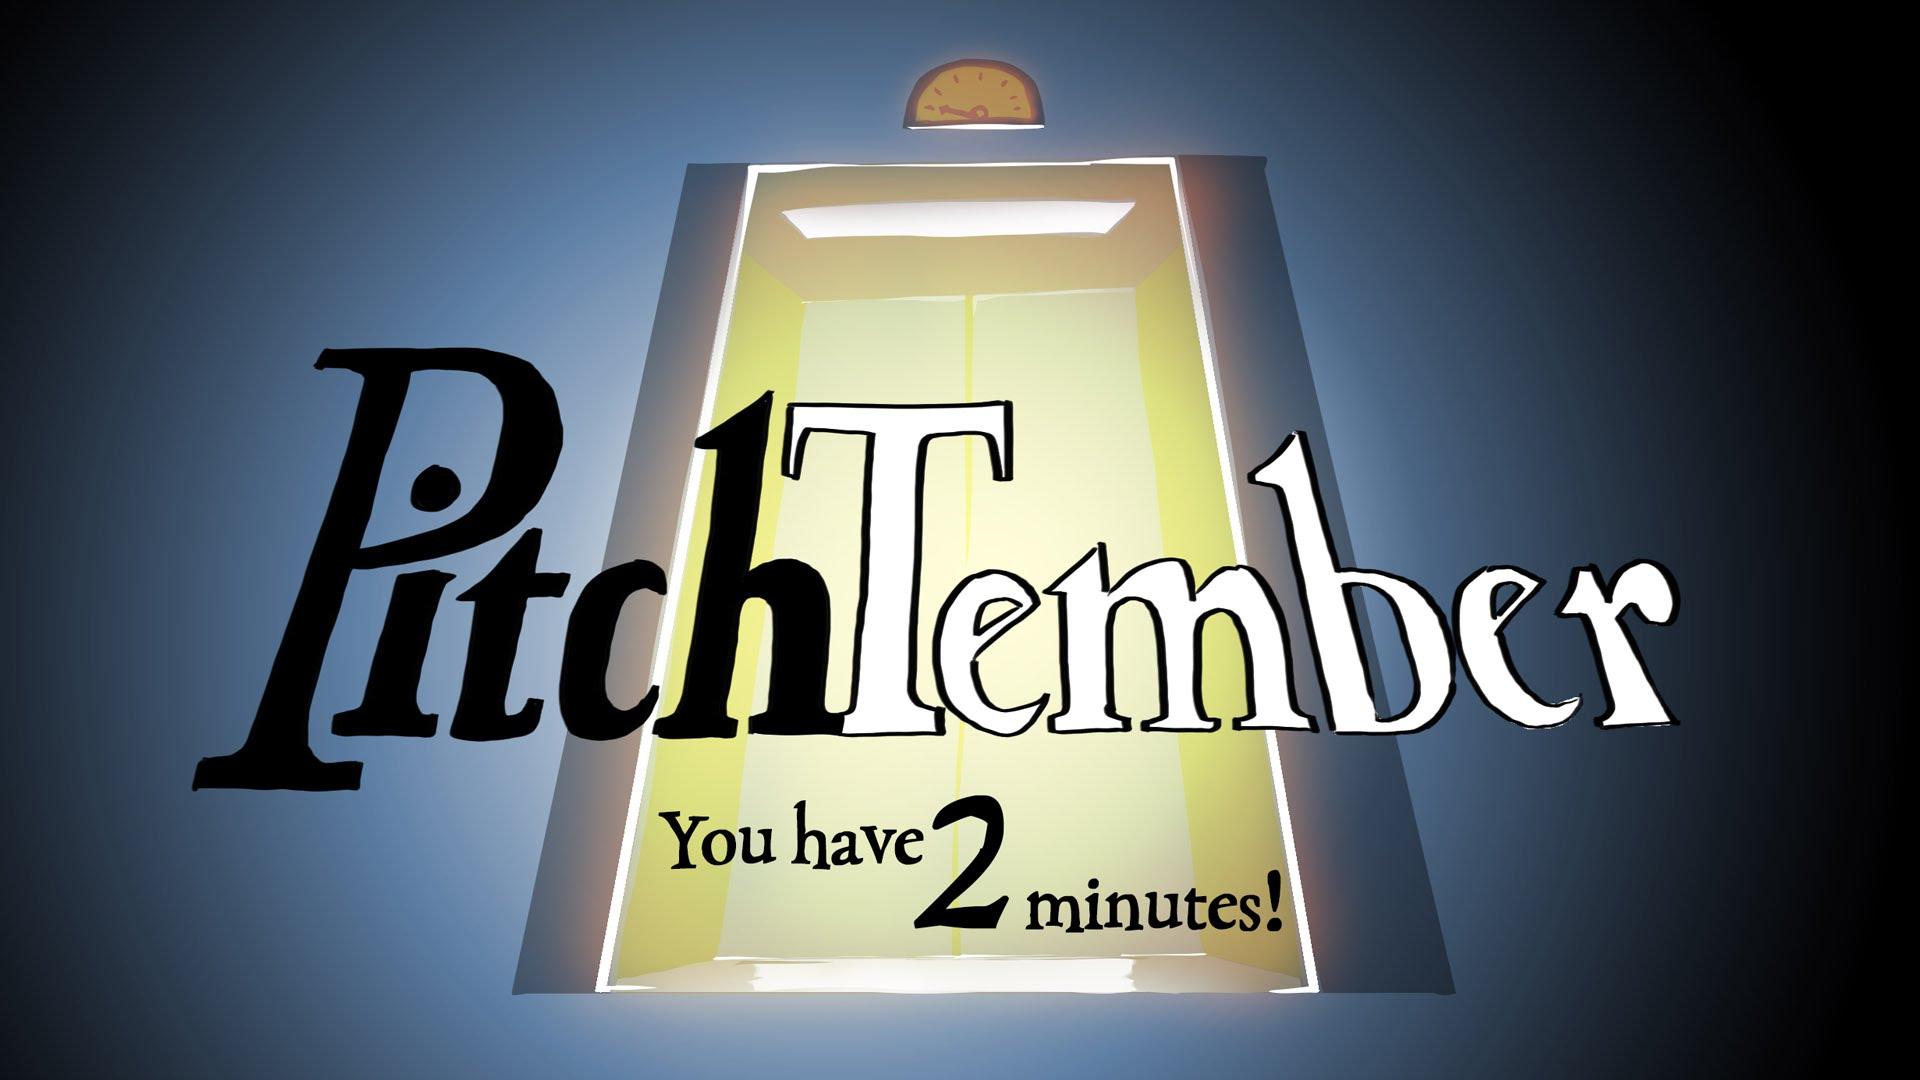 pitchtember